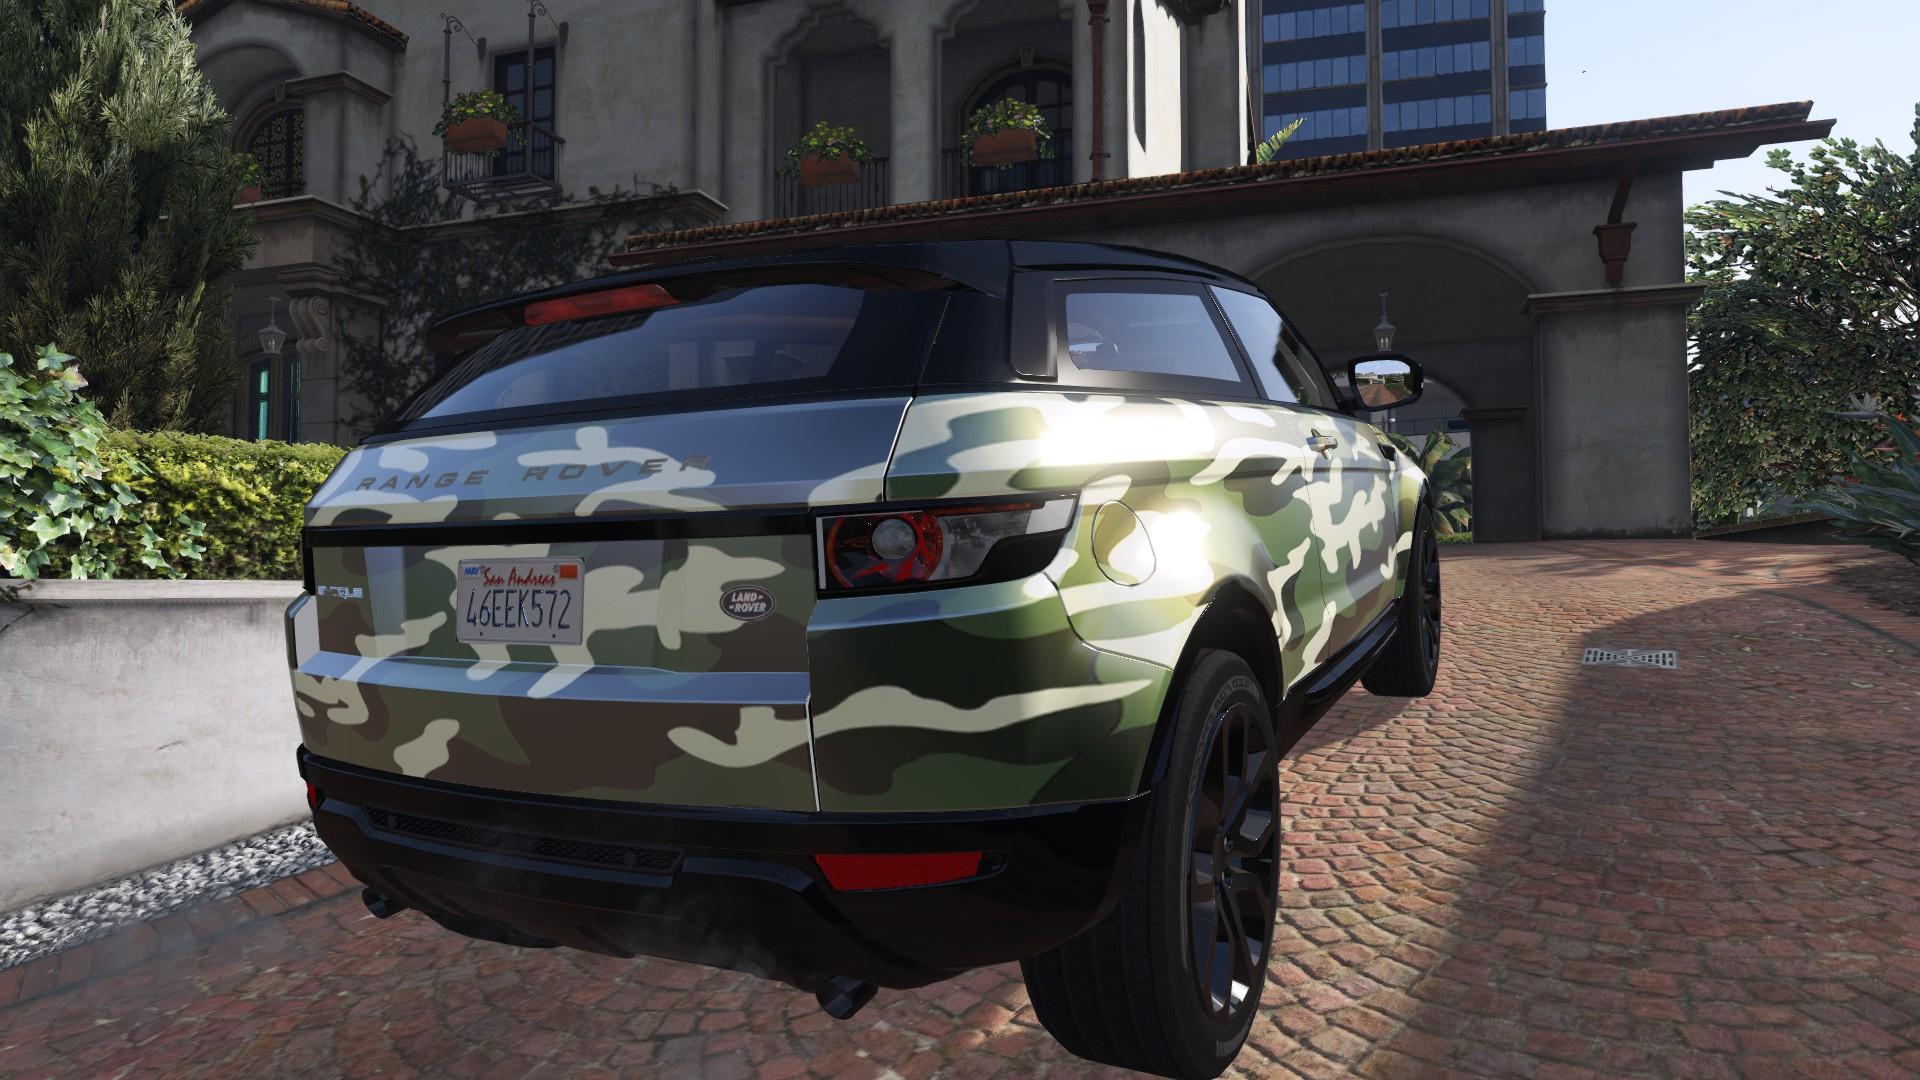 camouflage skull livery for range rover evoque 2 versions gta5. Black Bedroom Furniture Sets. Home Design Ideas